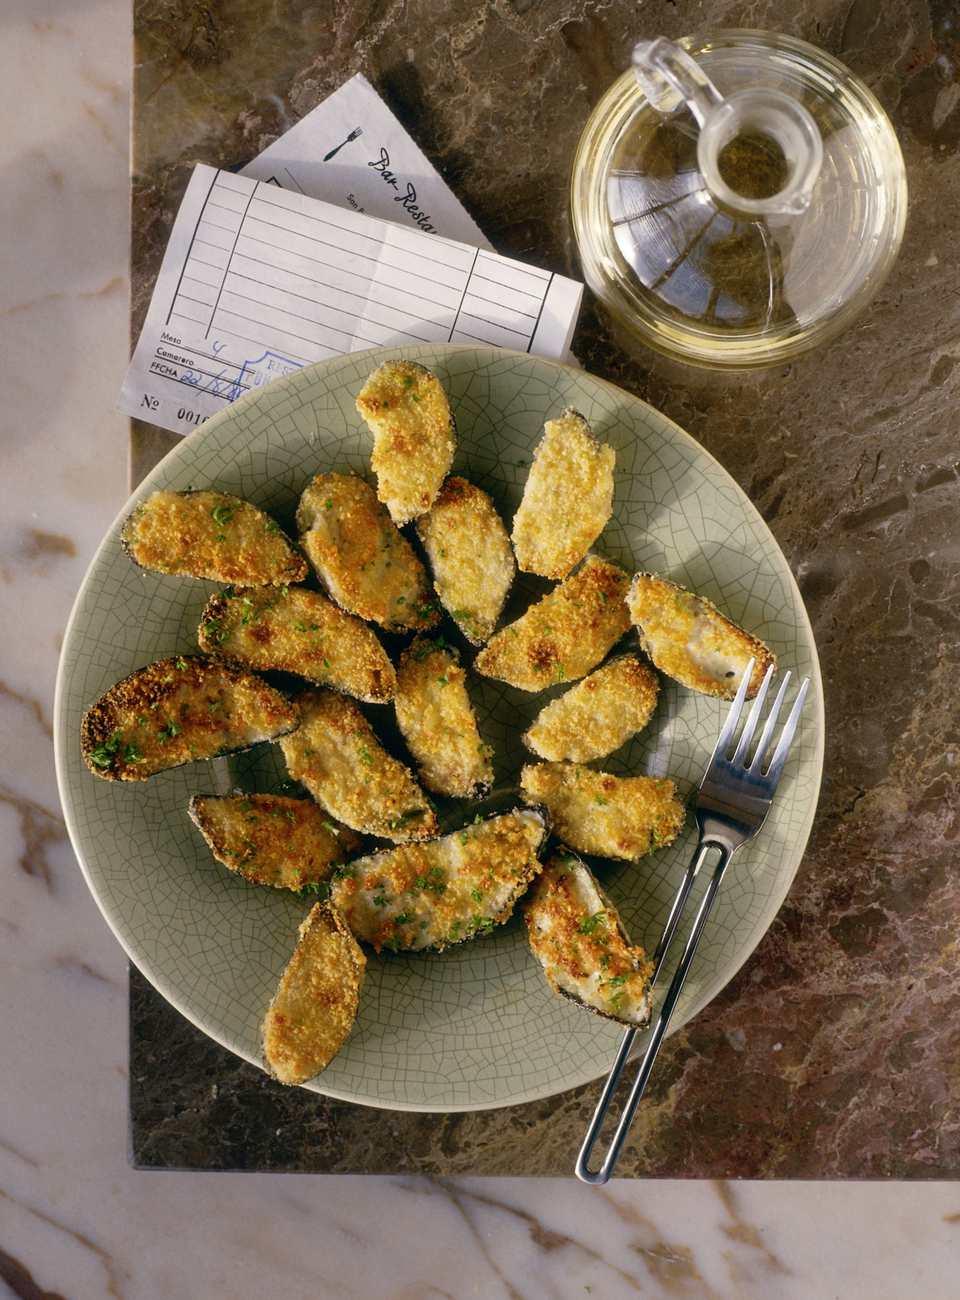 Tapas dish of fried stuffed mussels